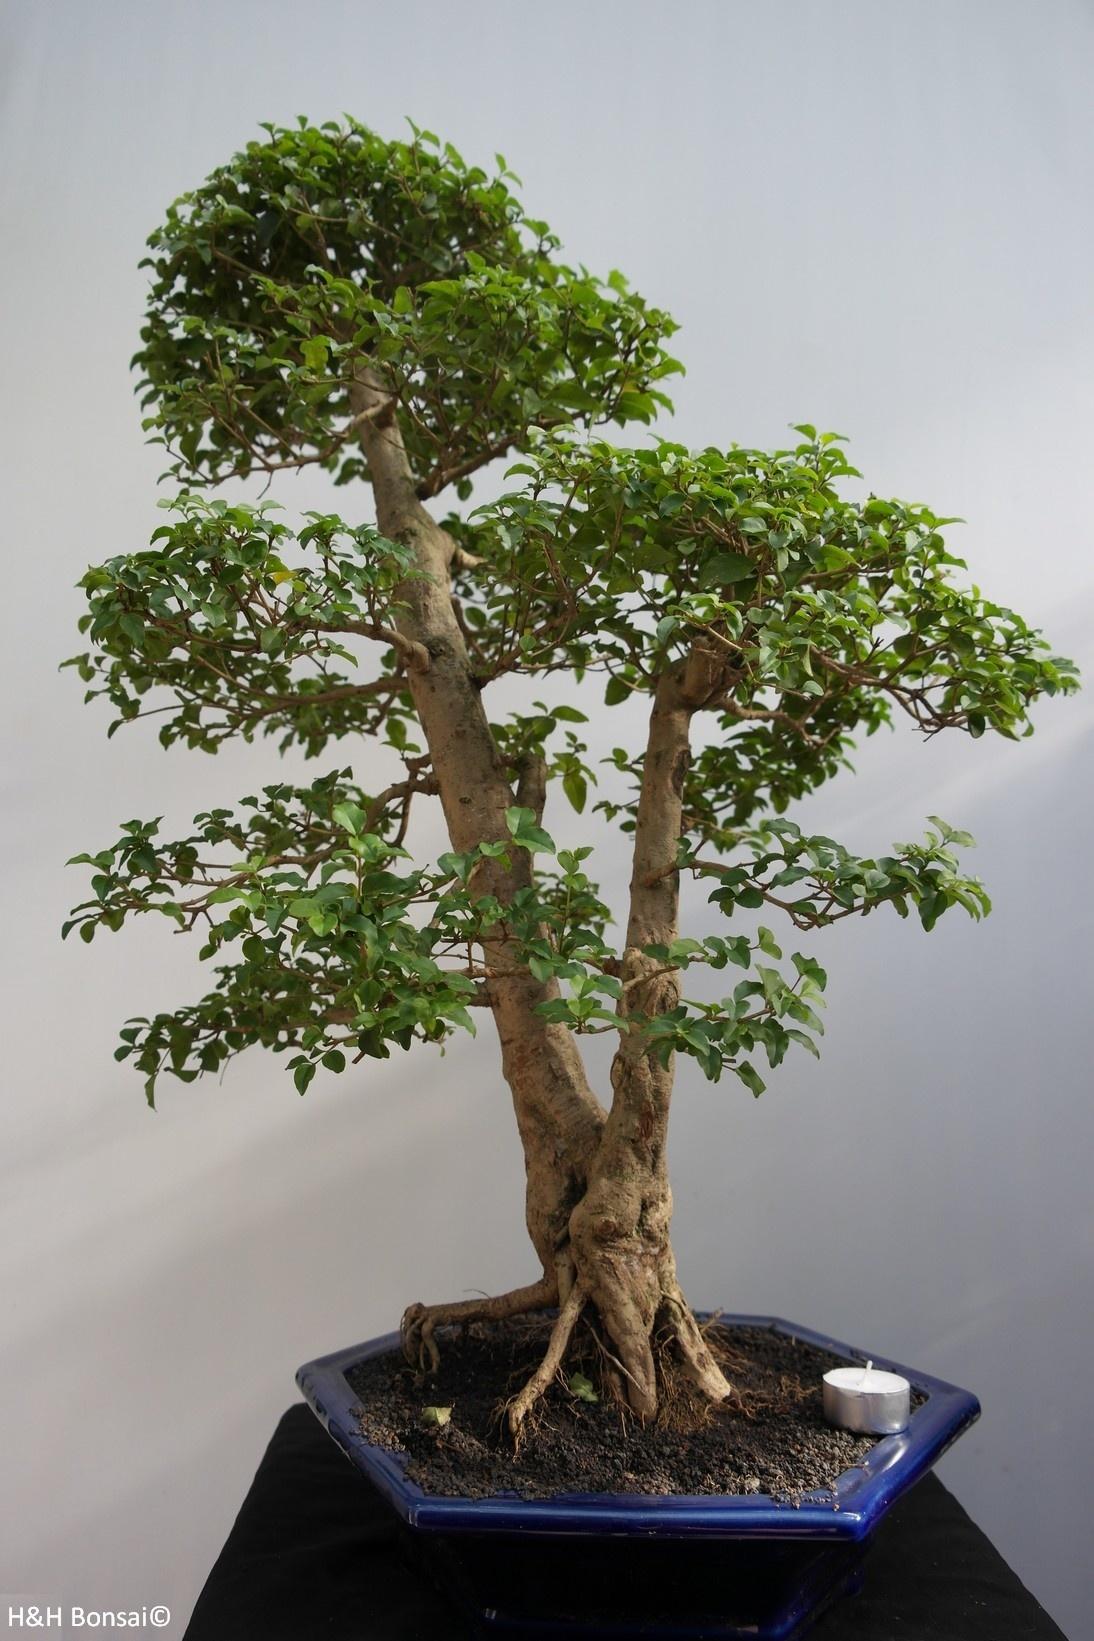 Bonsai Ligustro, Ligustrumsinense, no. 7846